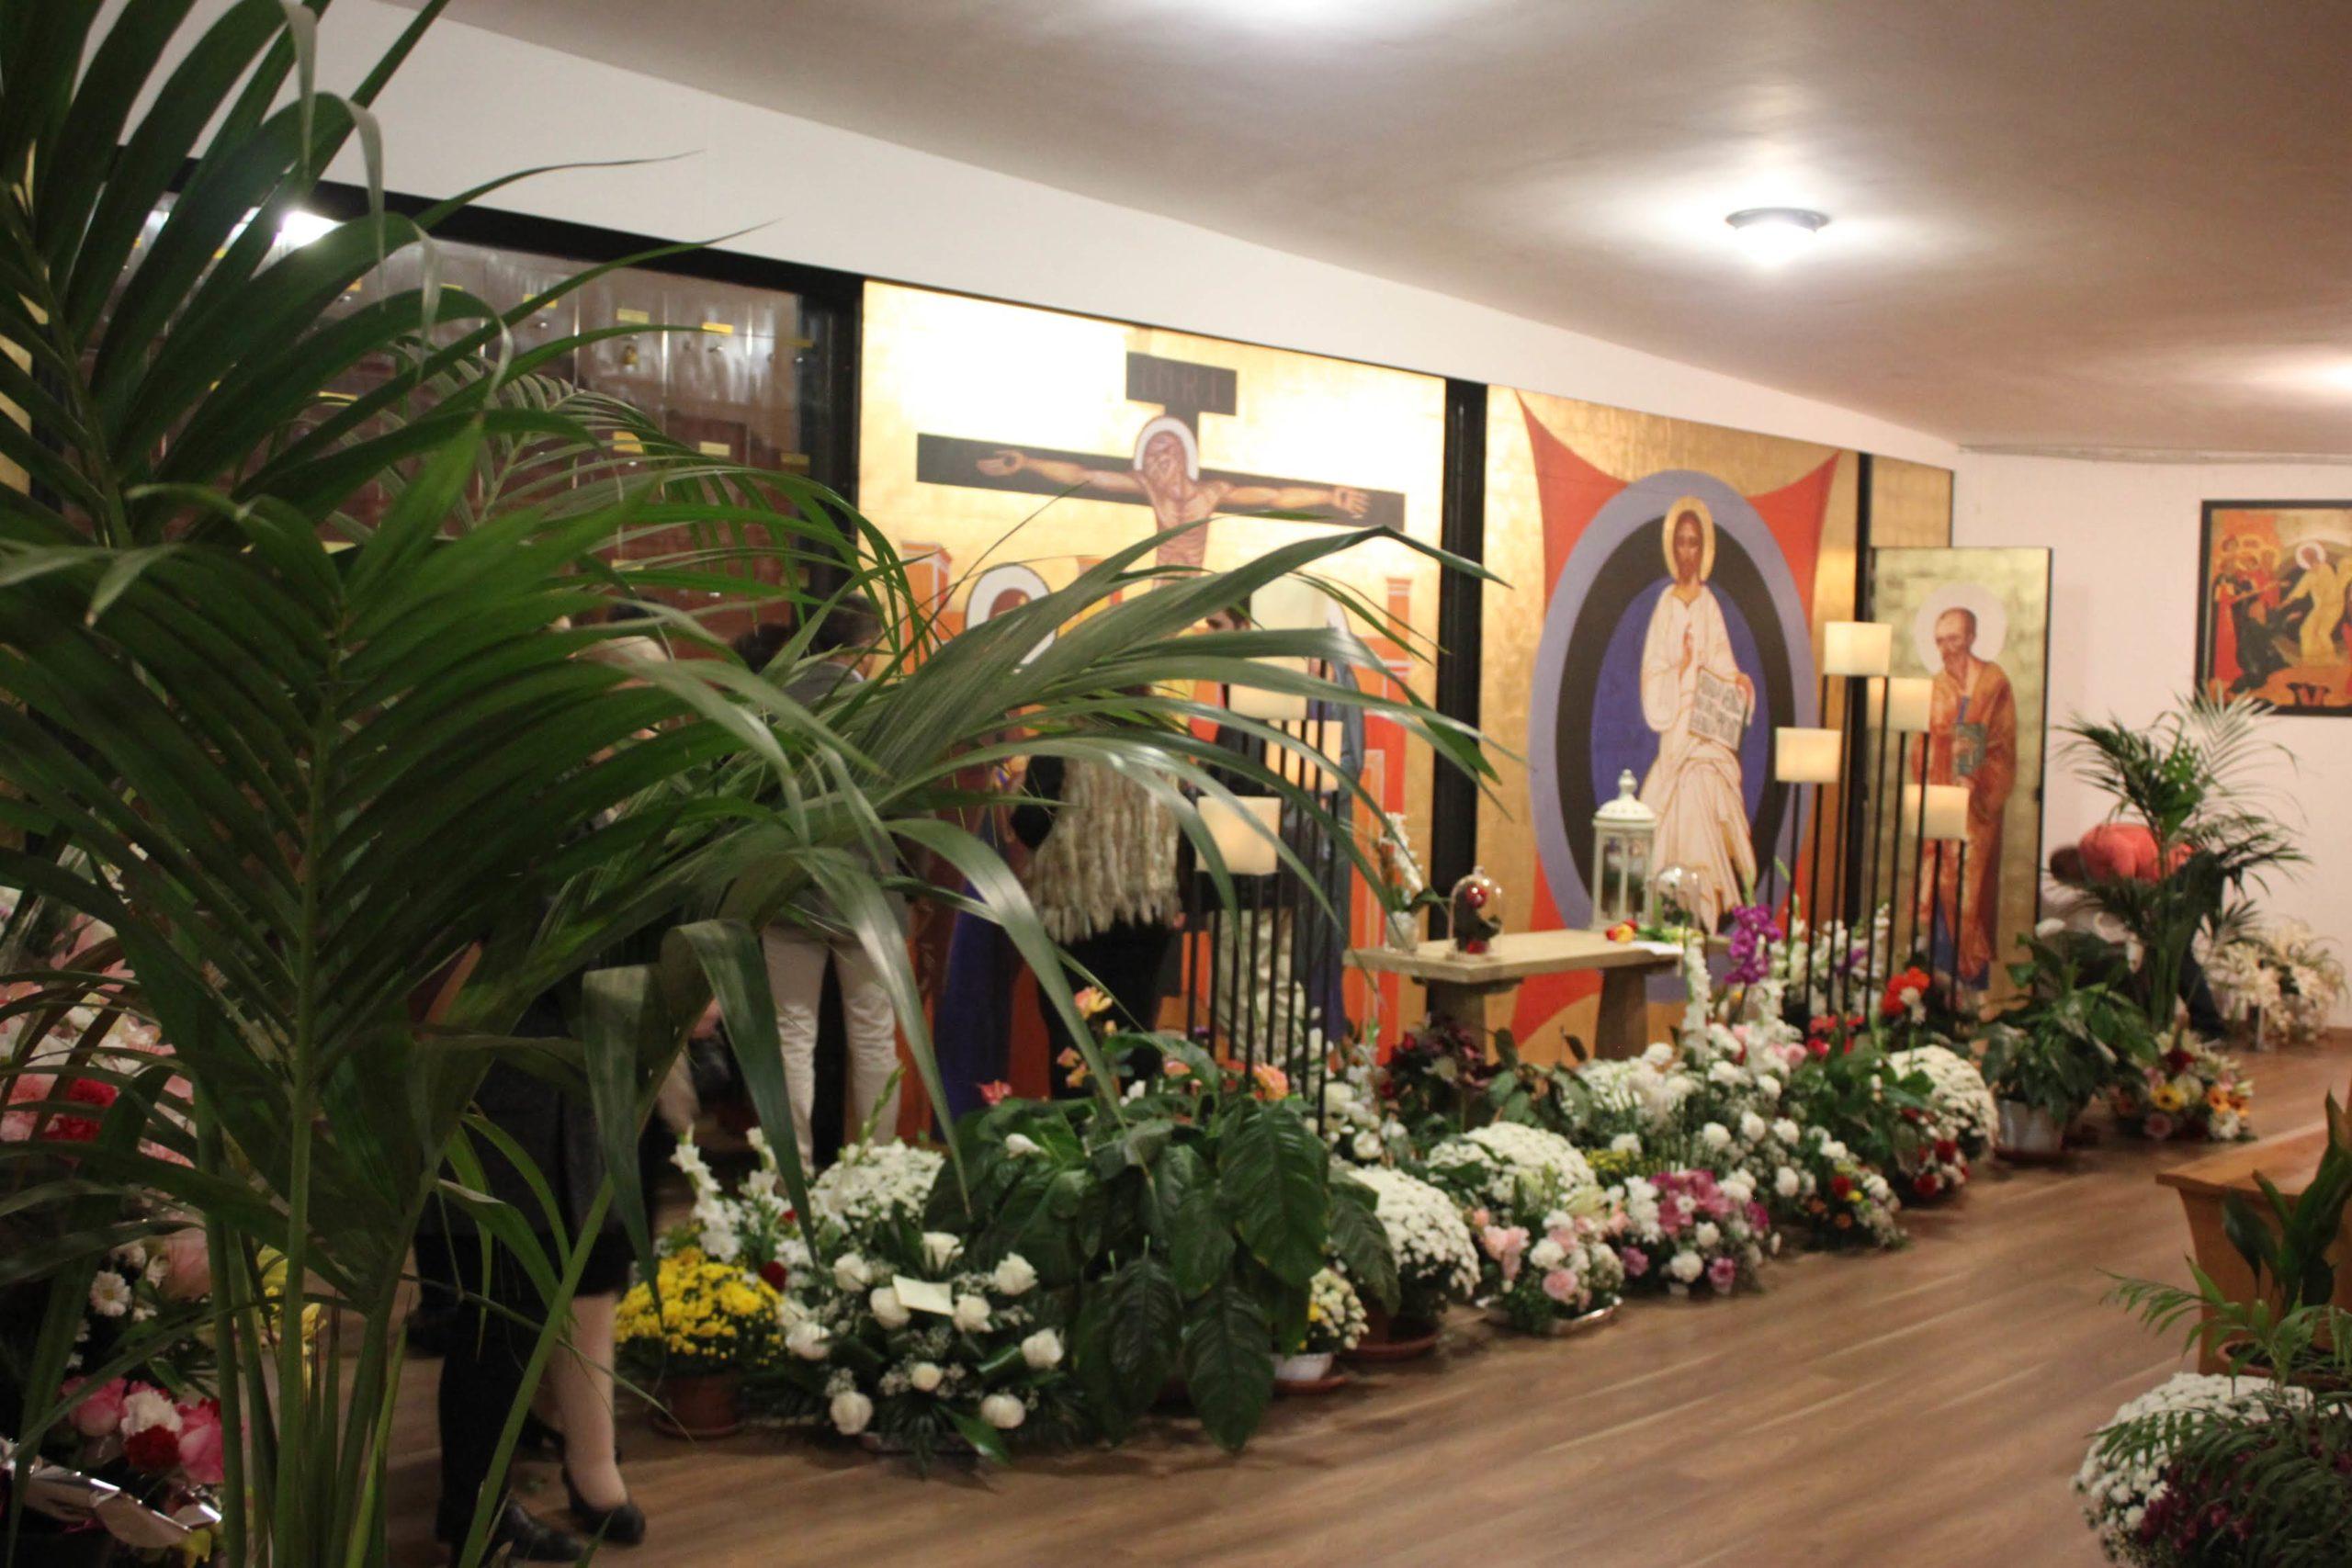 Visitas al Columbario Parroquial